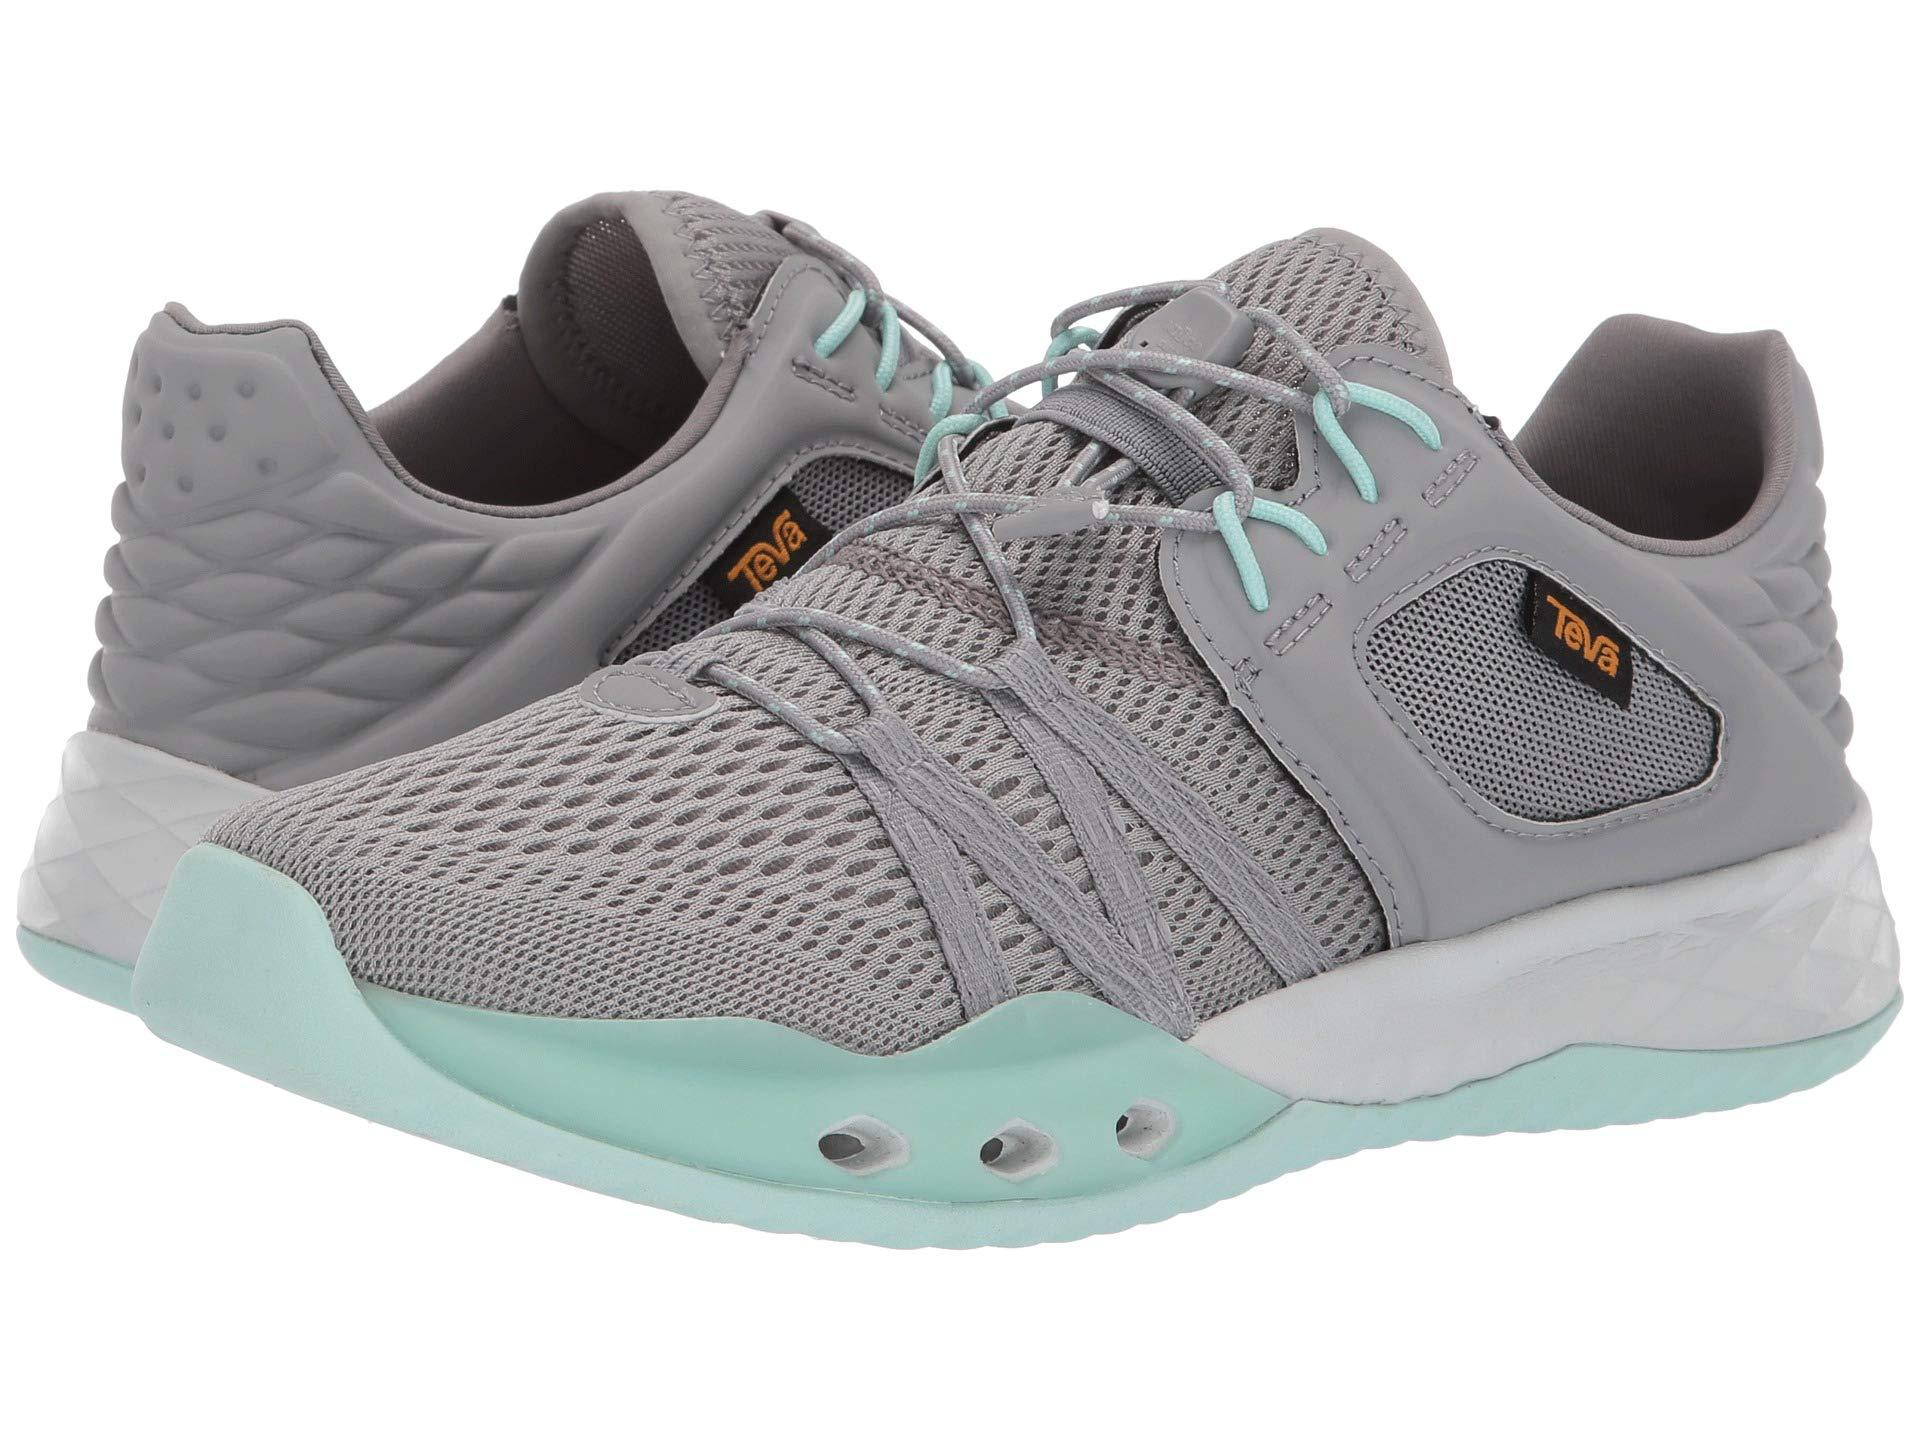 ab2c3daffd34 Lyst - Teva Terra-float Churn (plaza Taupe) Women s Shoes